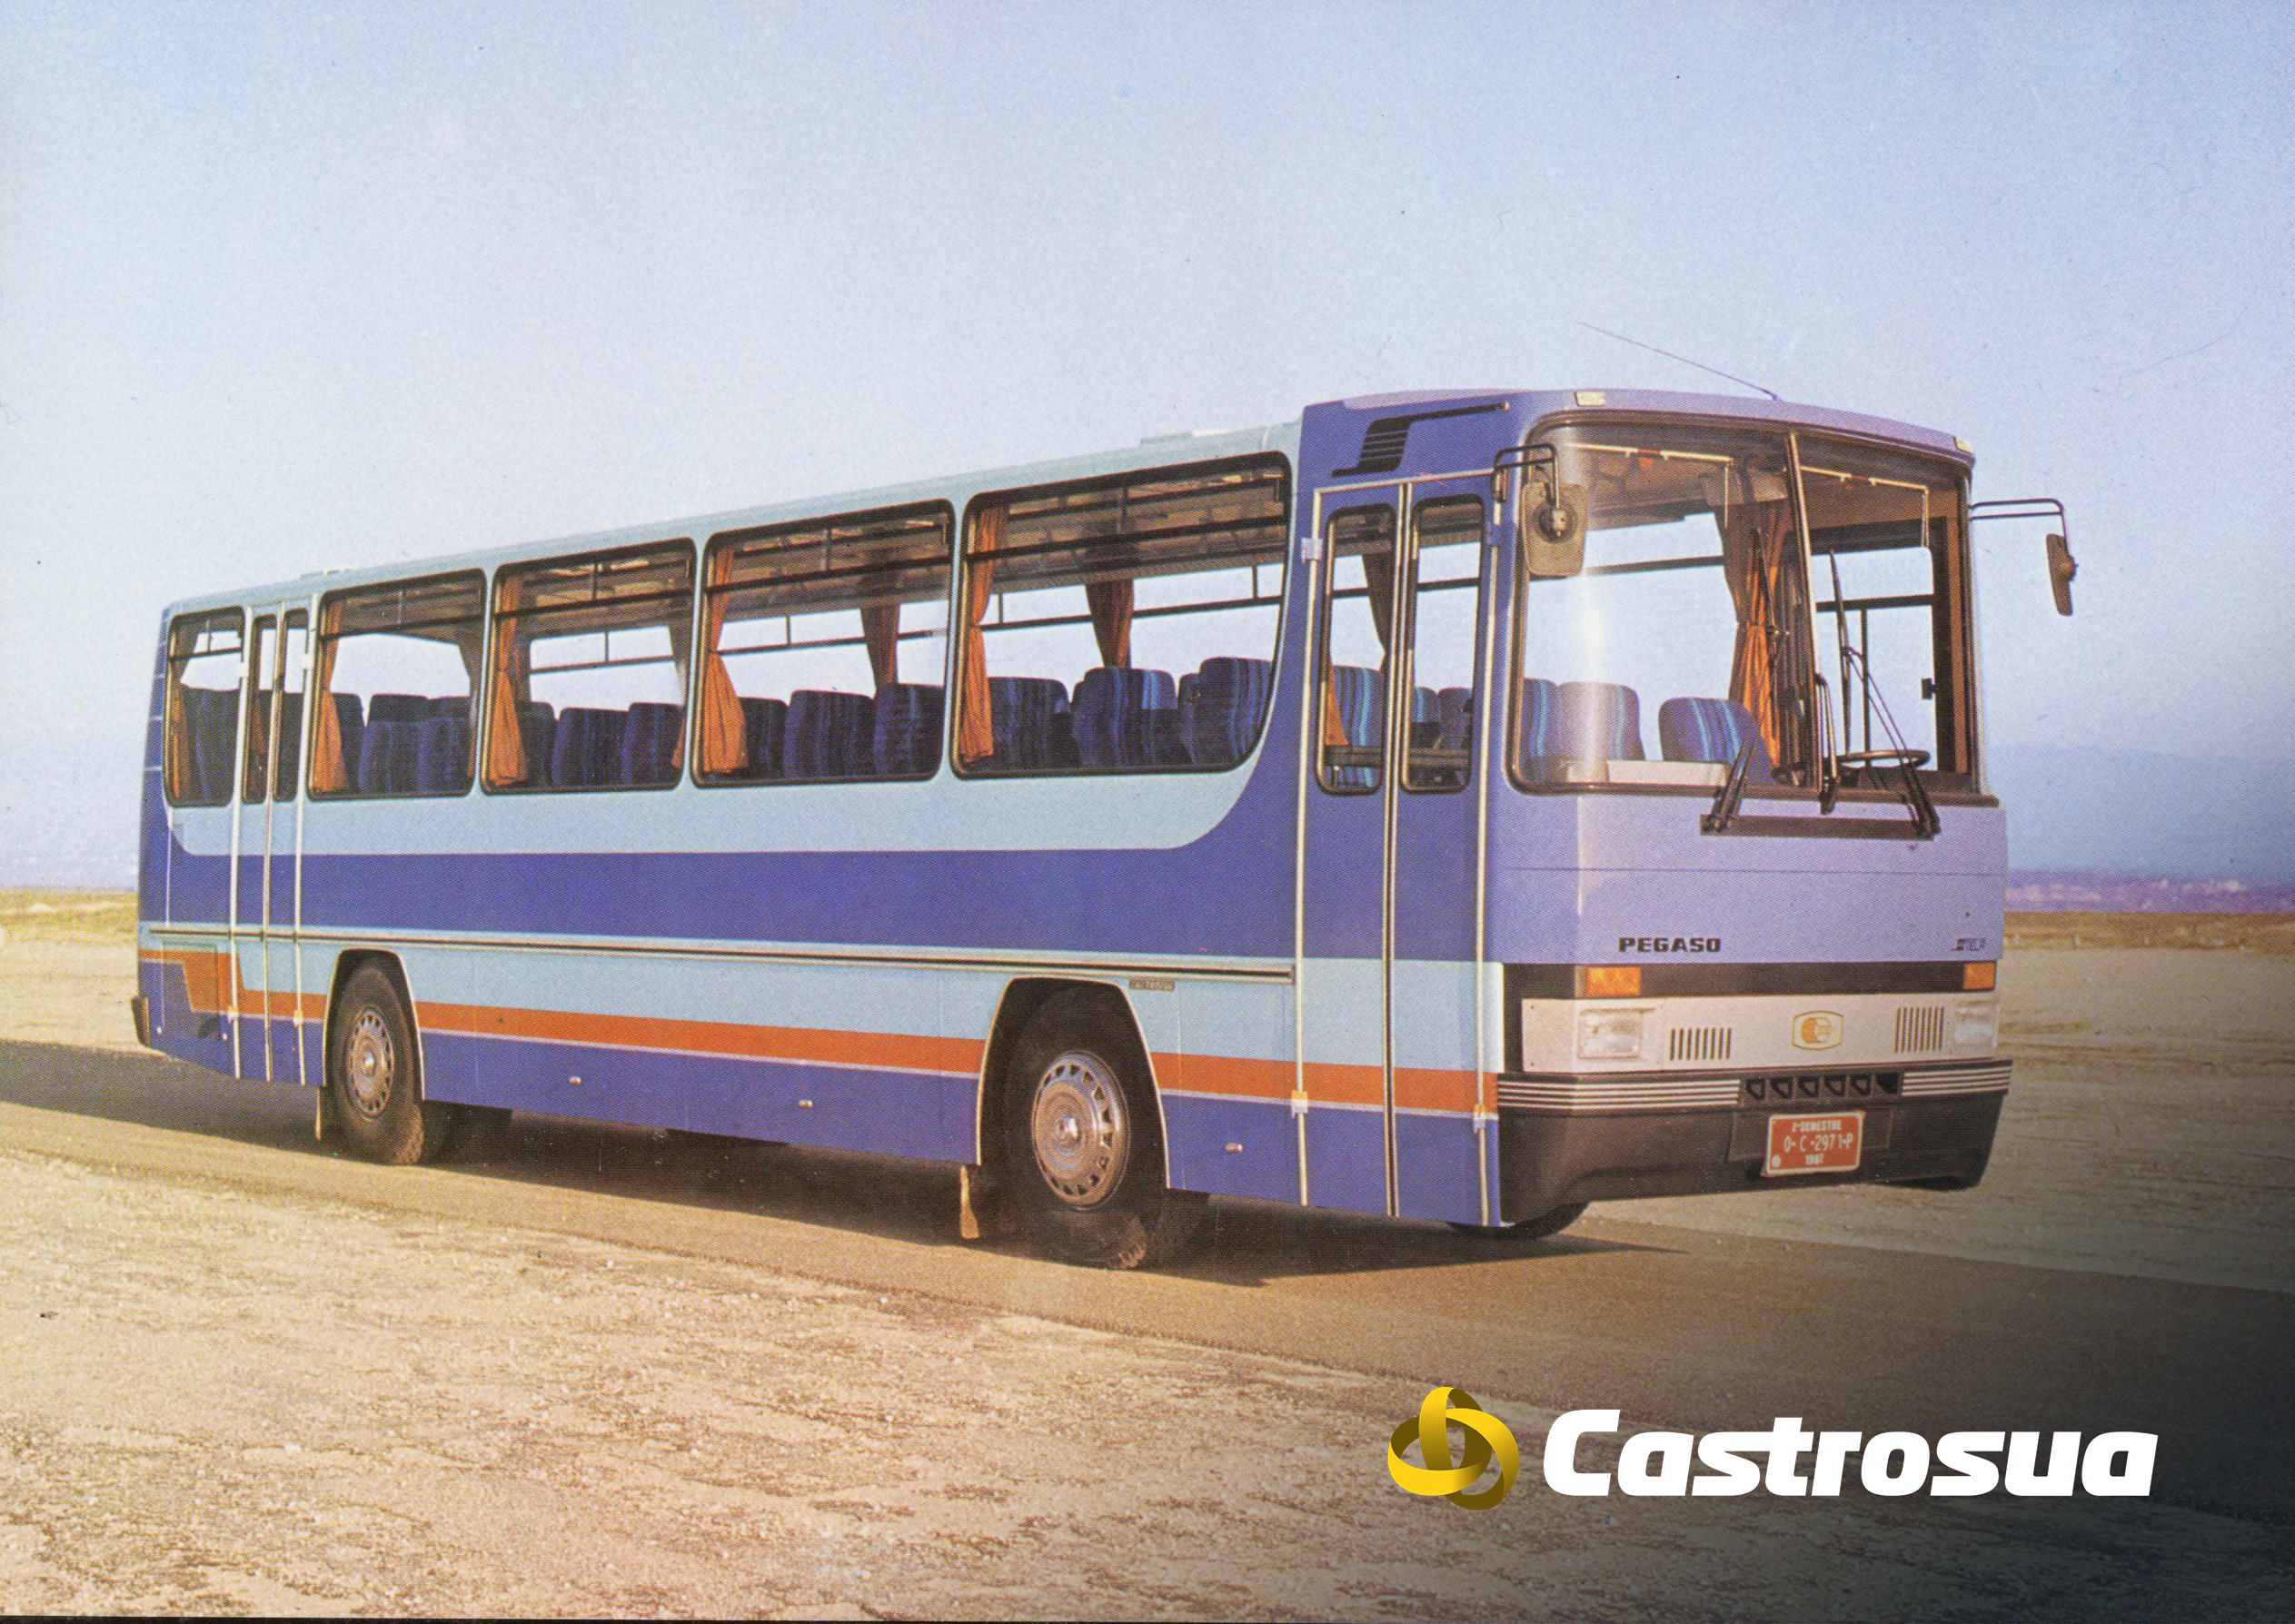 carrocería histórica Stela Castrosua